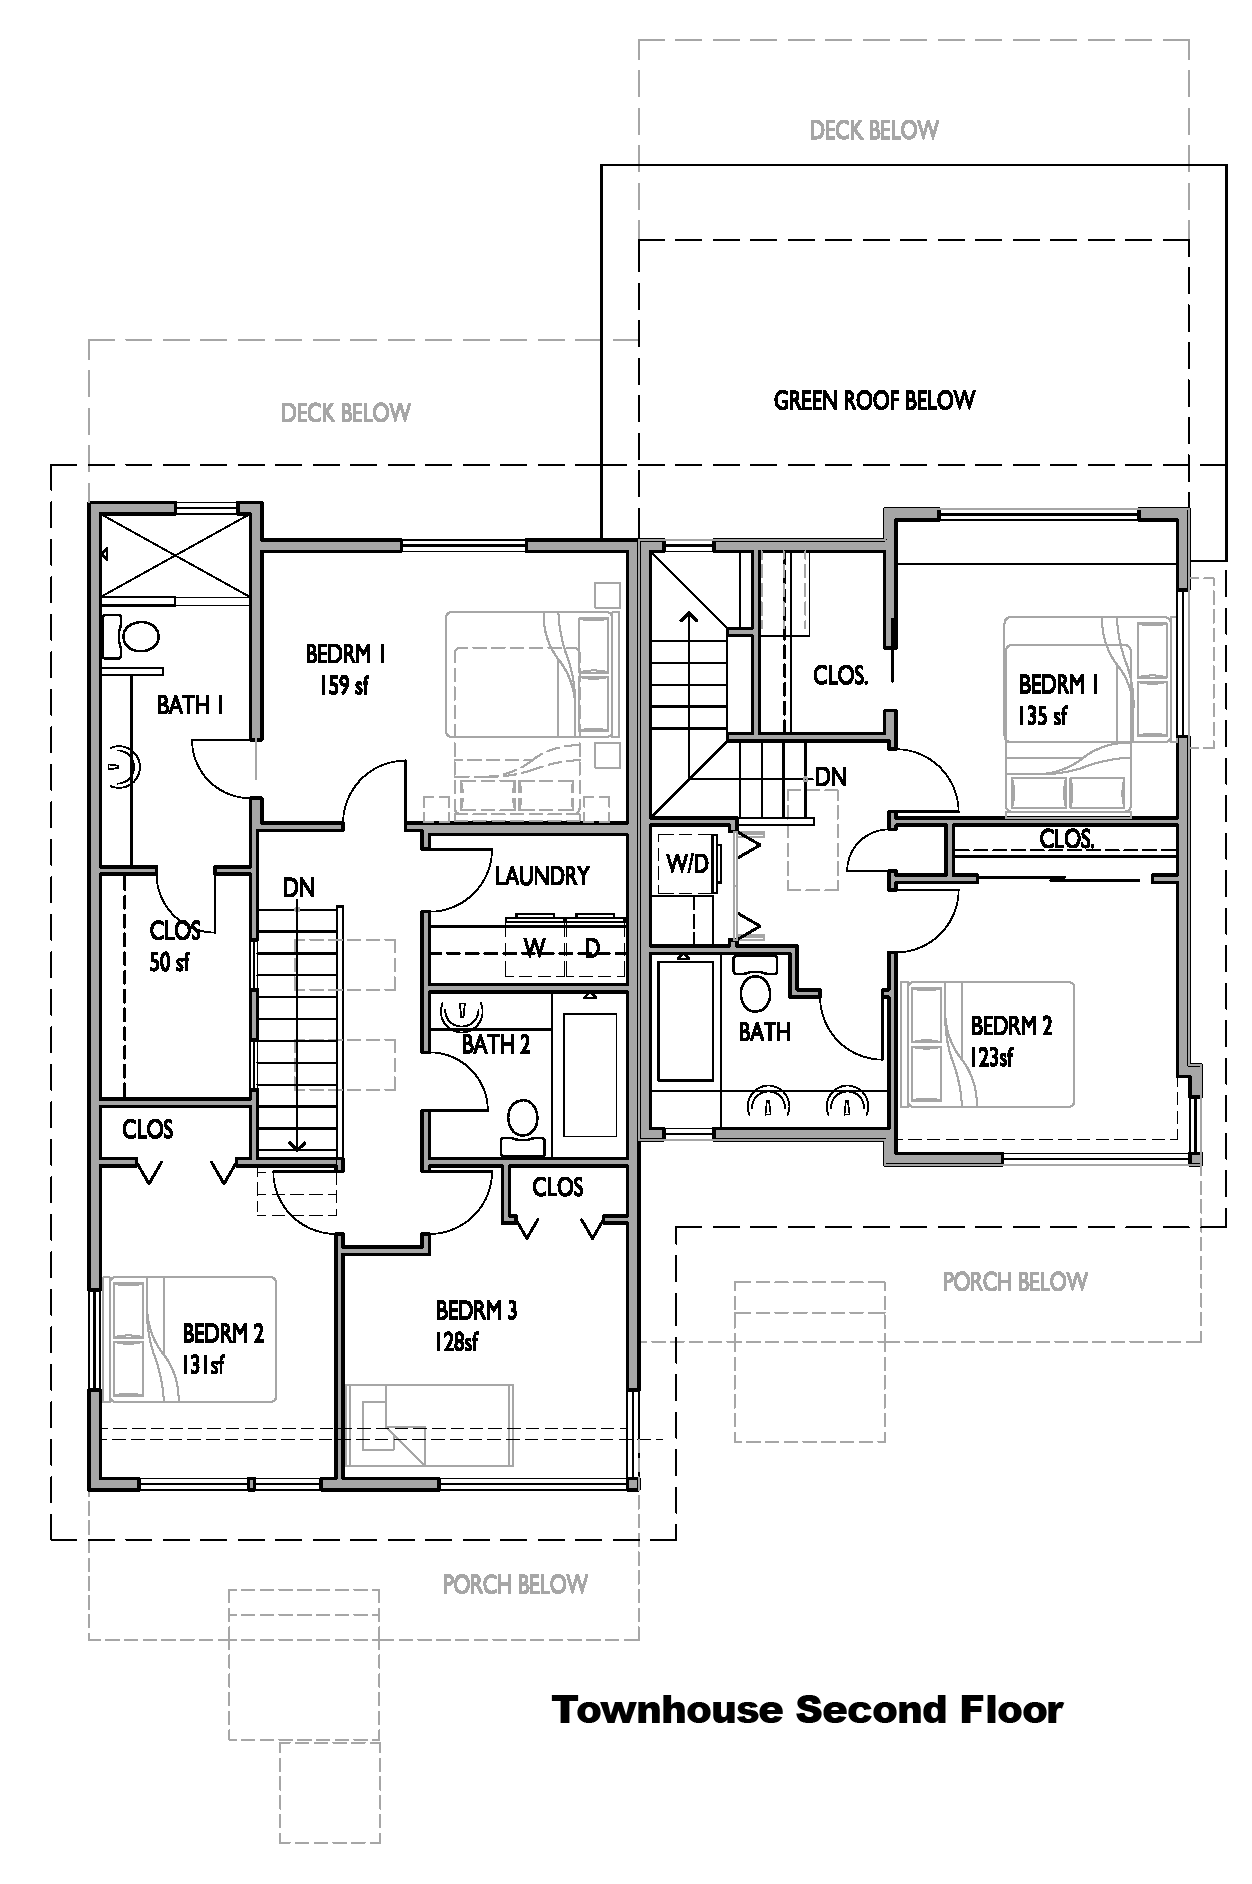 Electrical Plan Of Single Family Dwelling